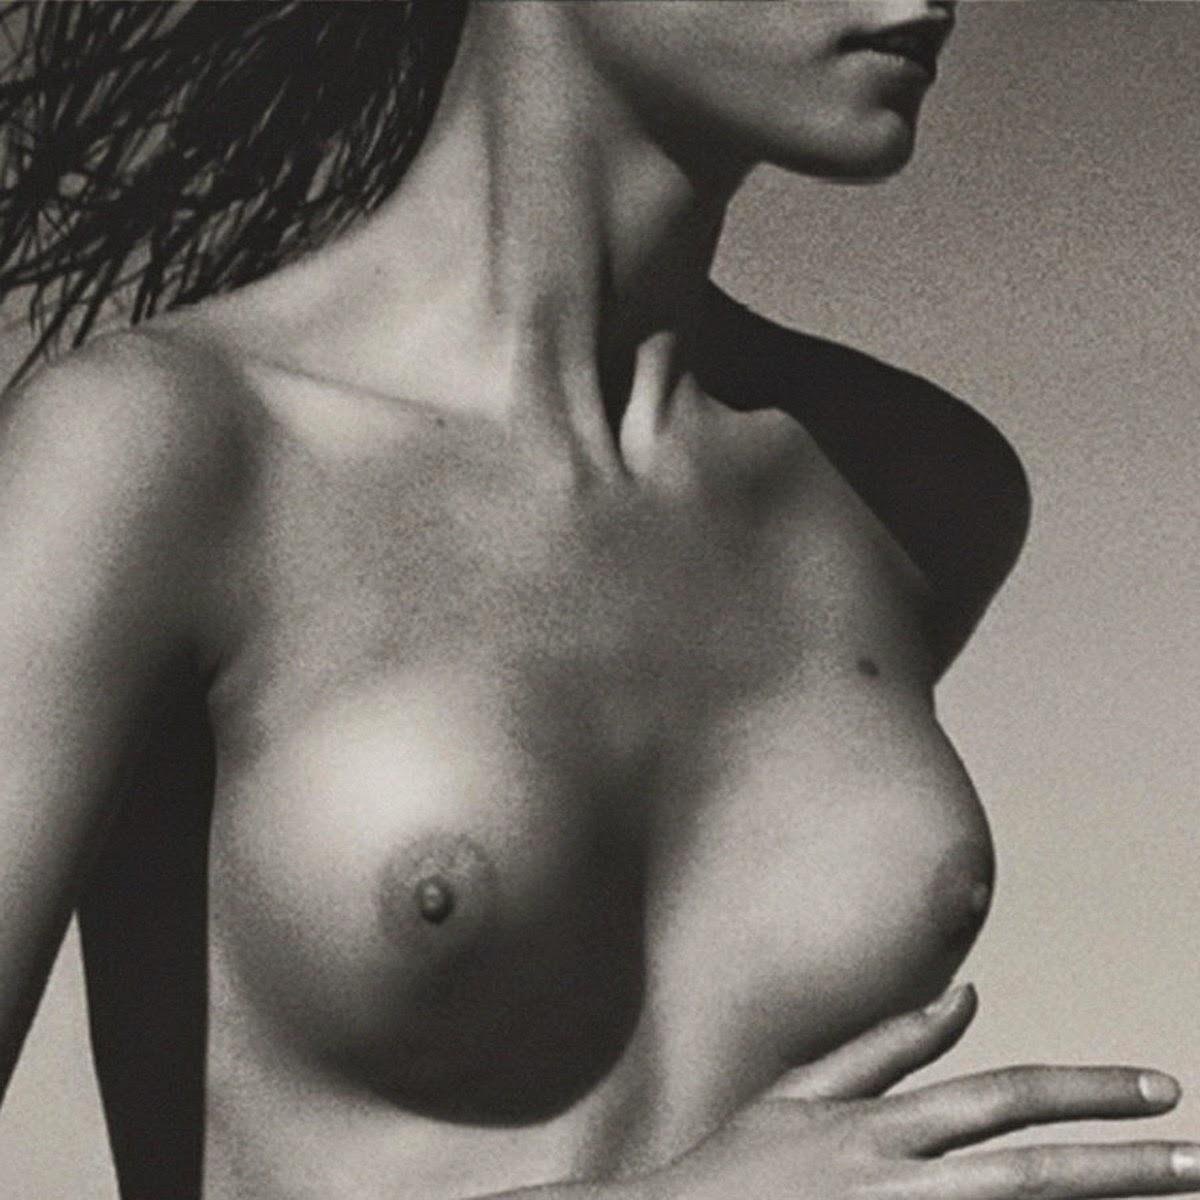 Fully naked naomi scott nude you